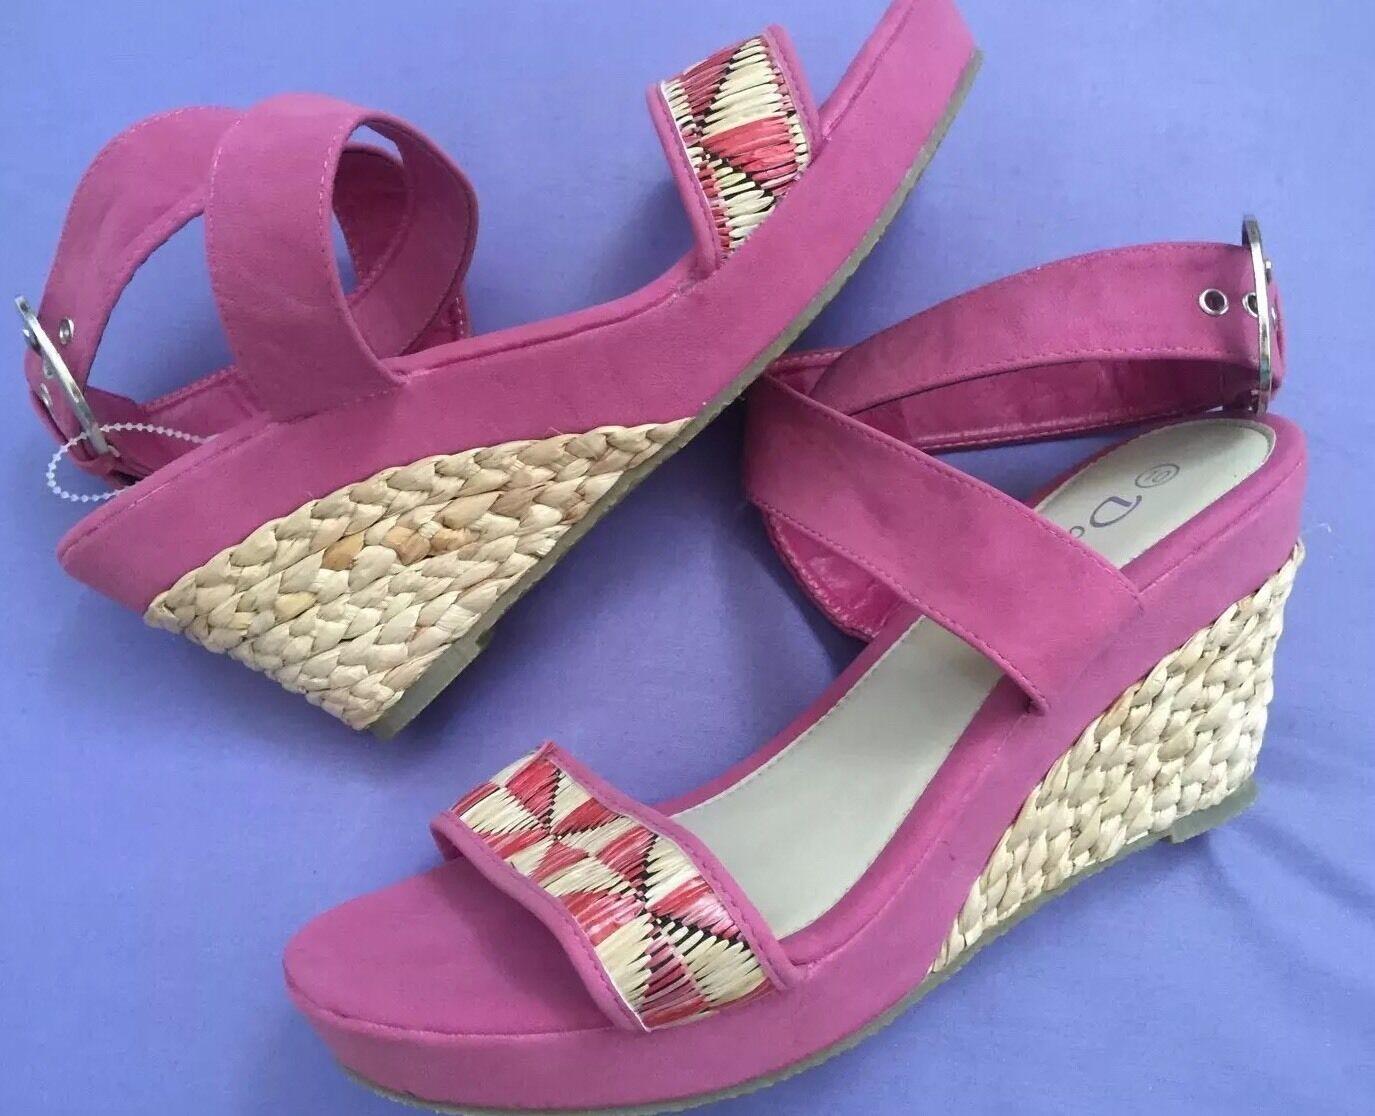 New Dalia Rafia Pink Faux Suede Strap Sandals Rafia Dalia Wedge sz 10 879051